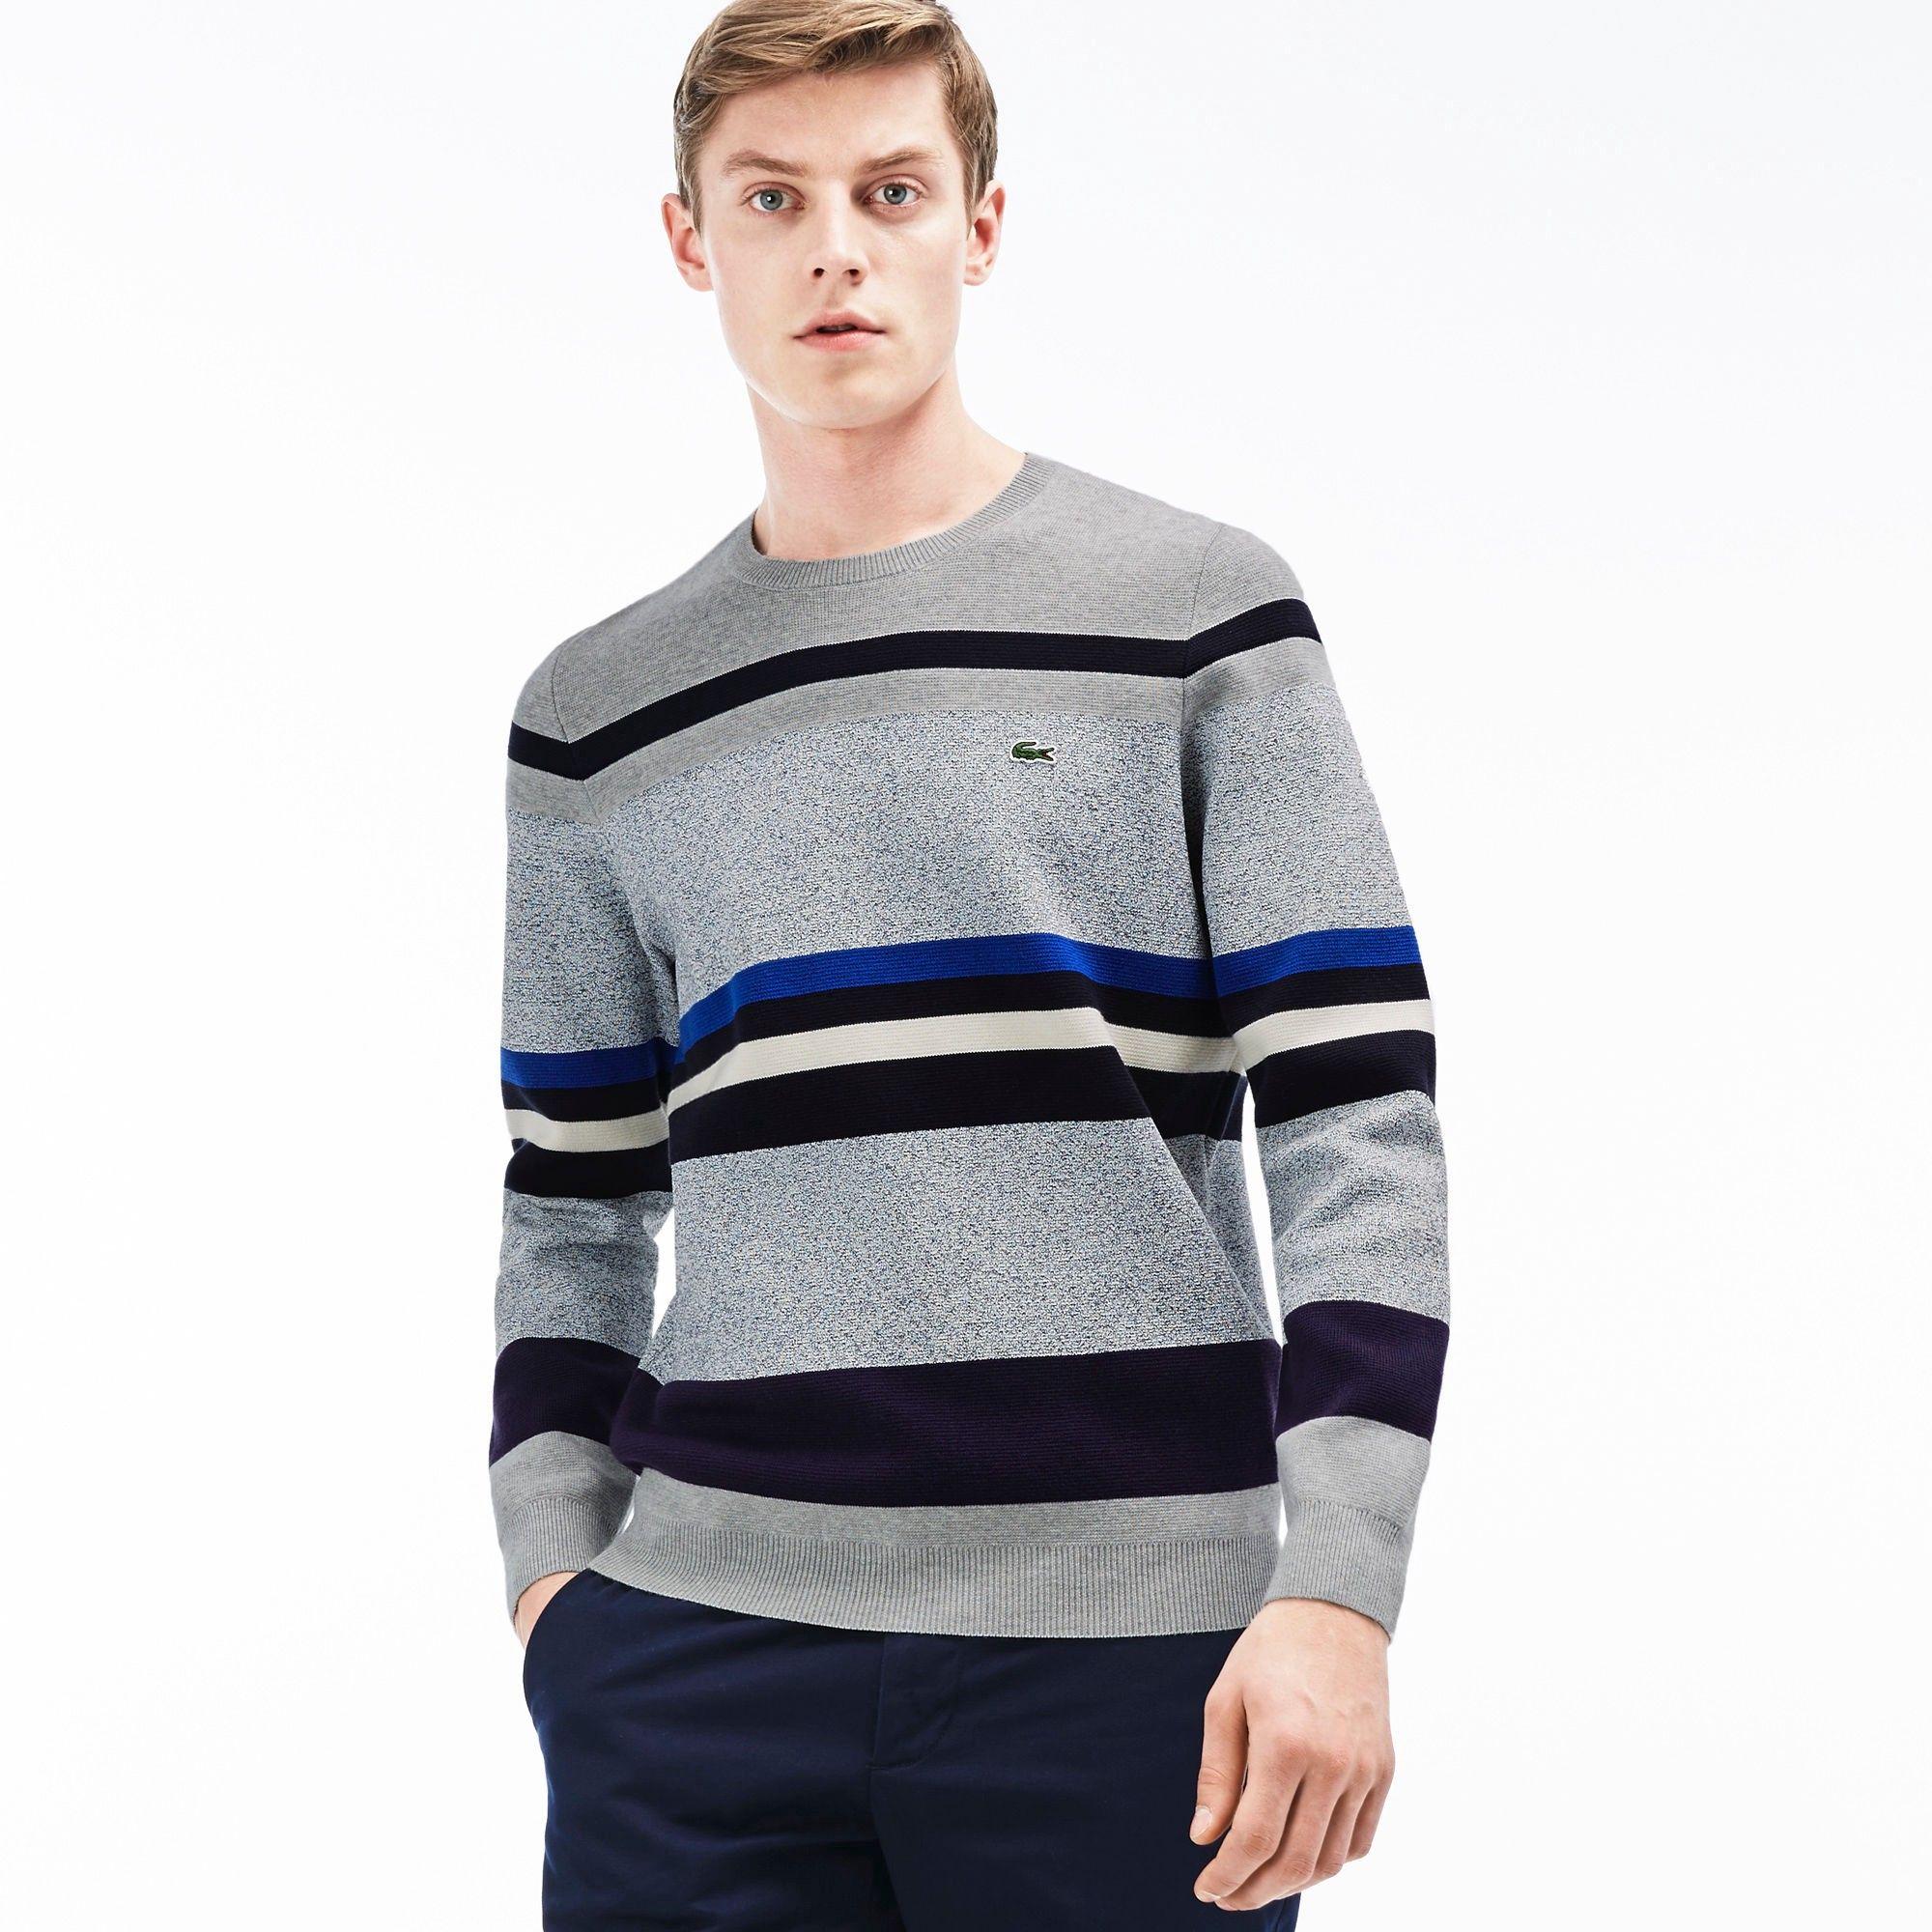 e6681789a2 LACOSTE Men'S Crew Neck Striped Color Block Sweatshirt - Silver Grey ...